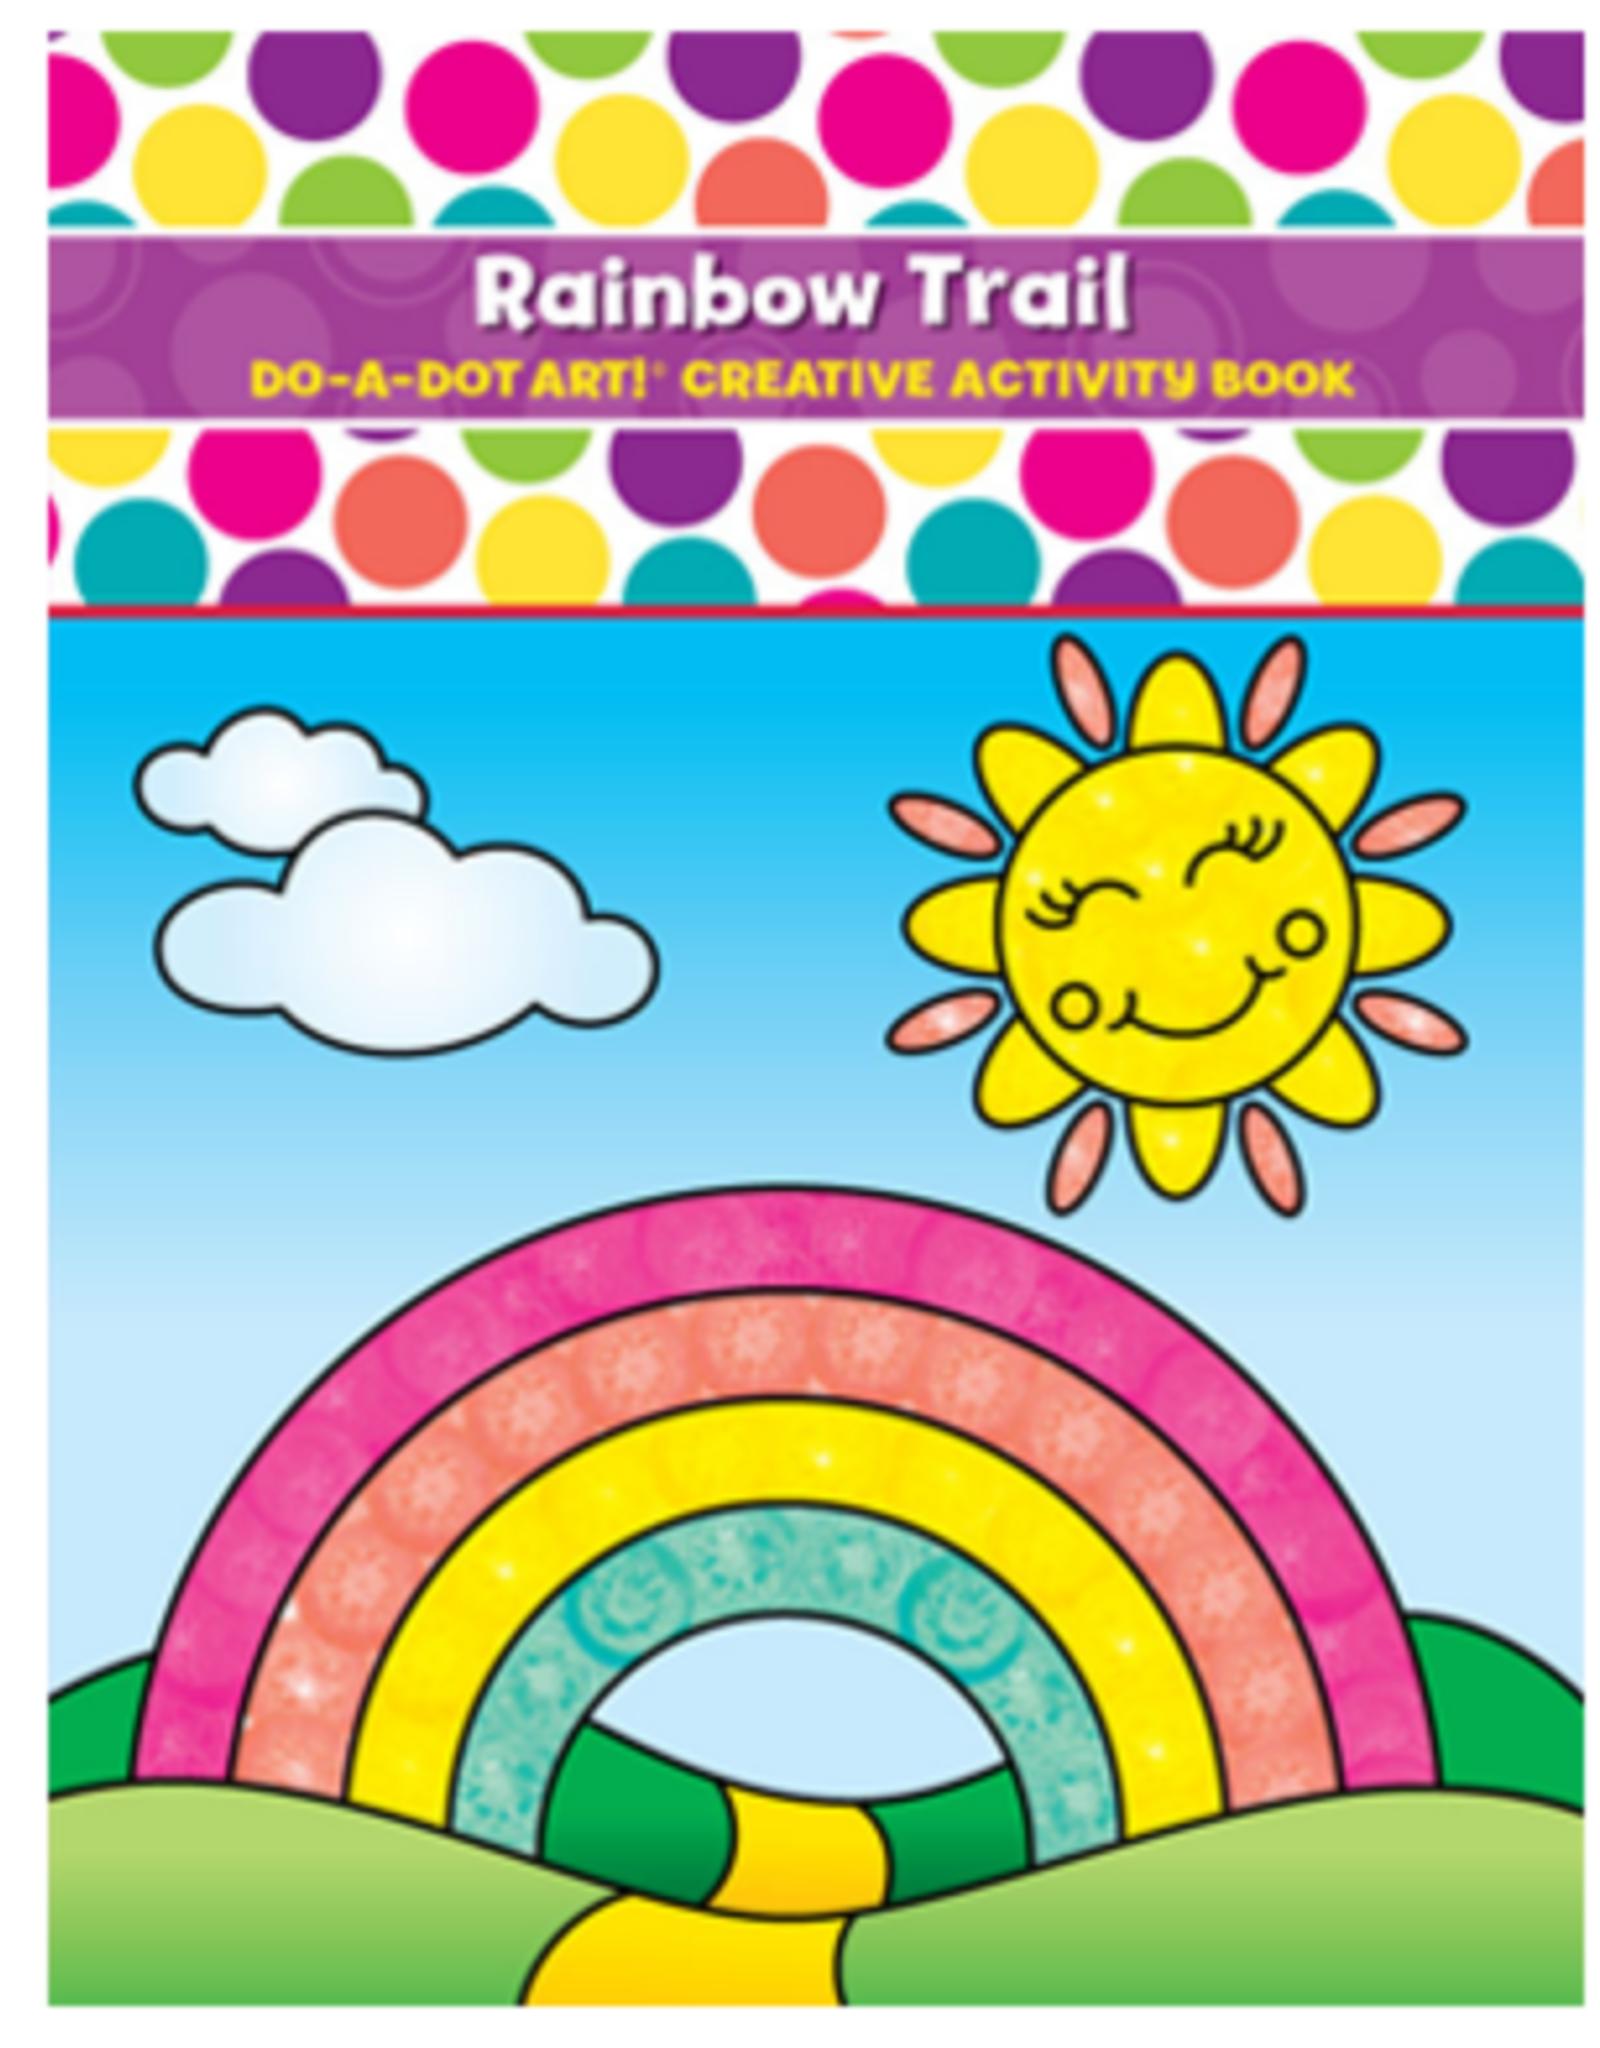 Do—a-Dot Rainbow Trail Book